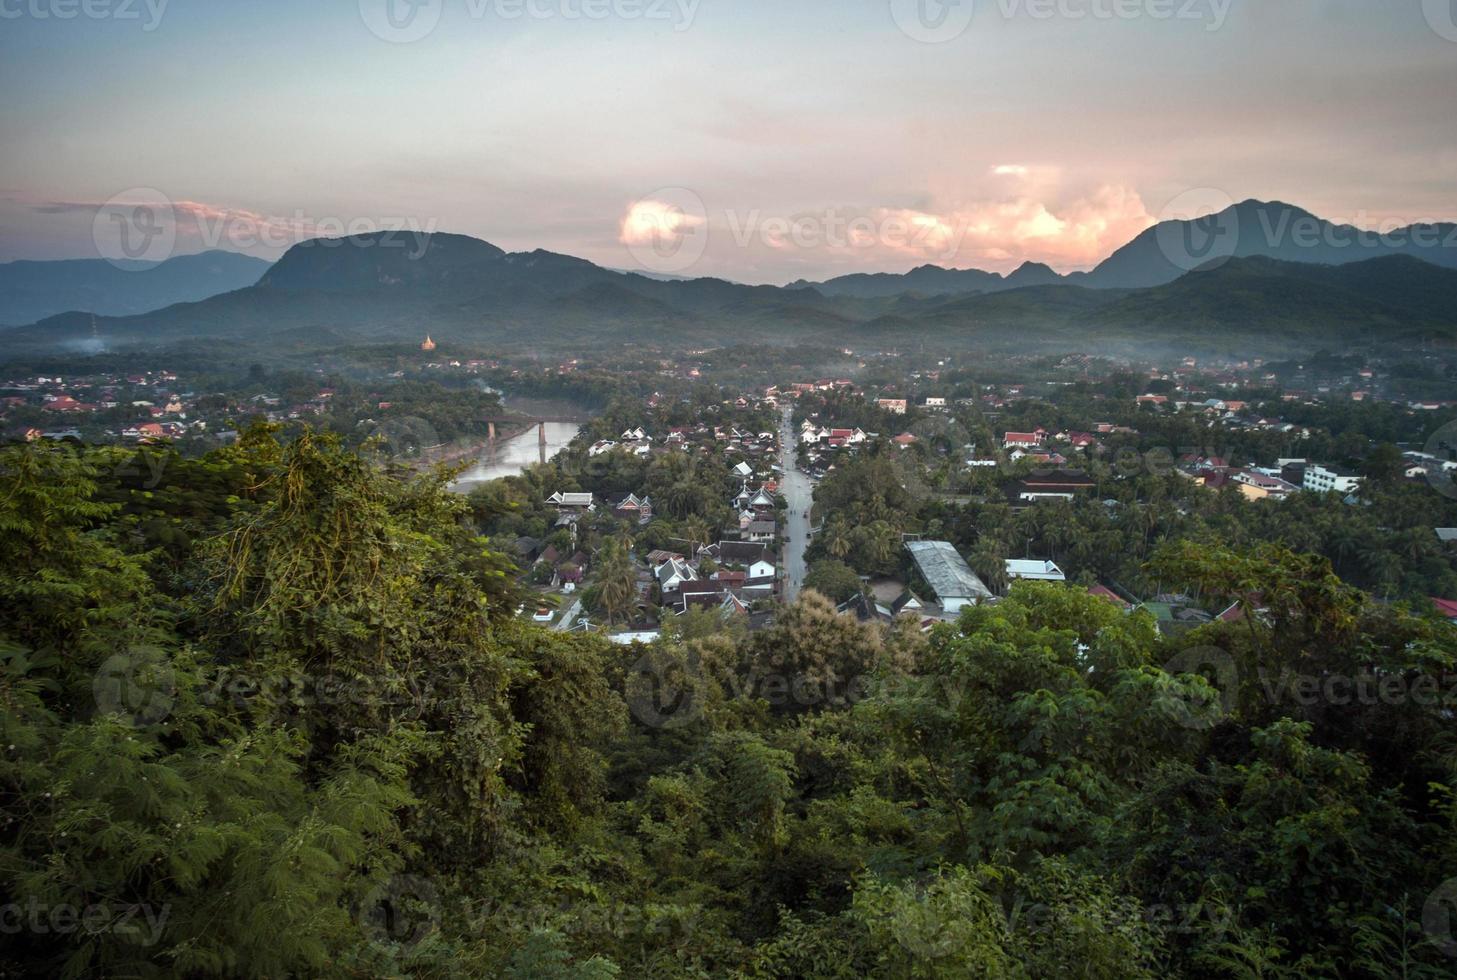 Luang Prabang, Laos form above photo